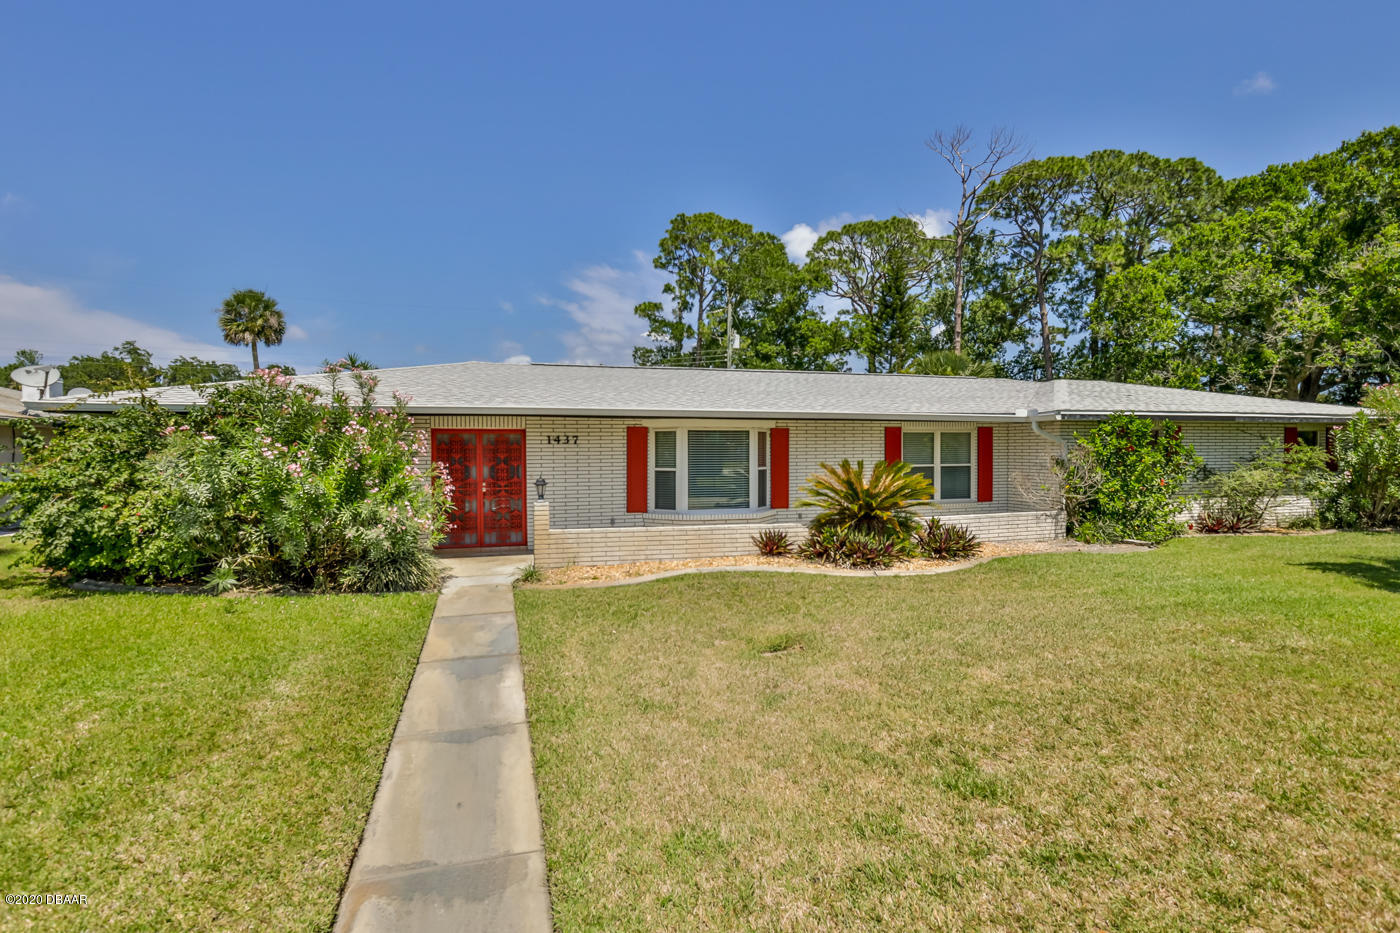 Photo of 1437 Golfview Drive, Daytona Beach, FL 32114